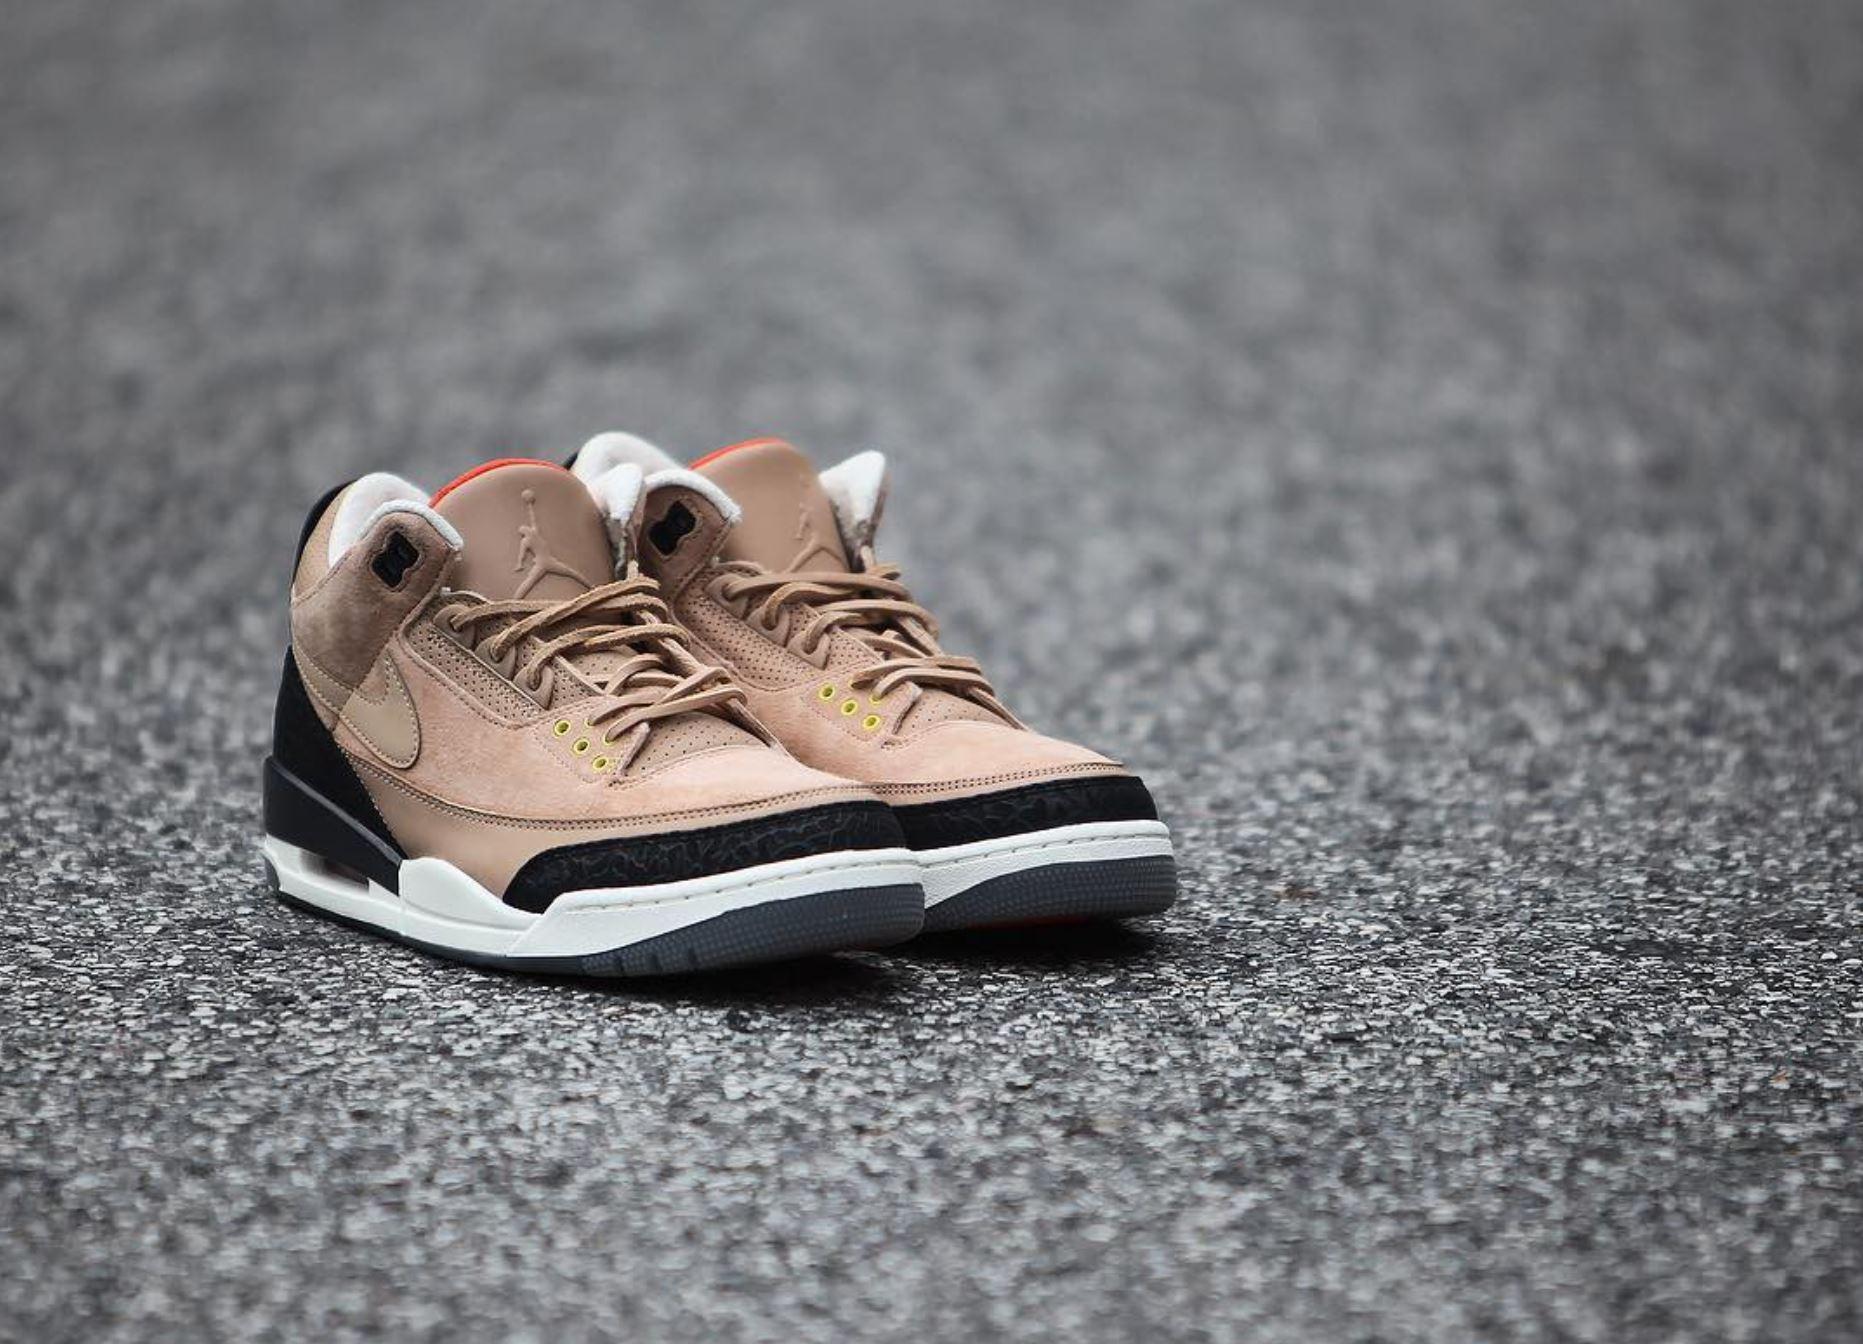 sports shoes ec2b6 929a7 air jordan 3 bio beige justin timberlake detailed look ...